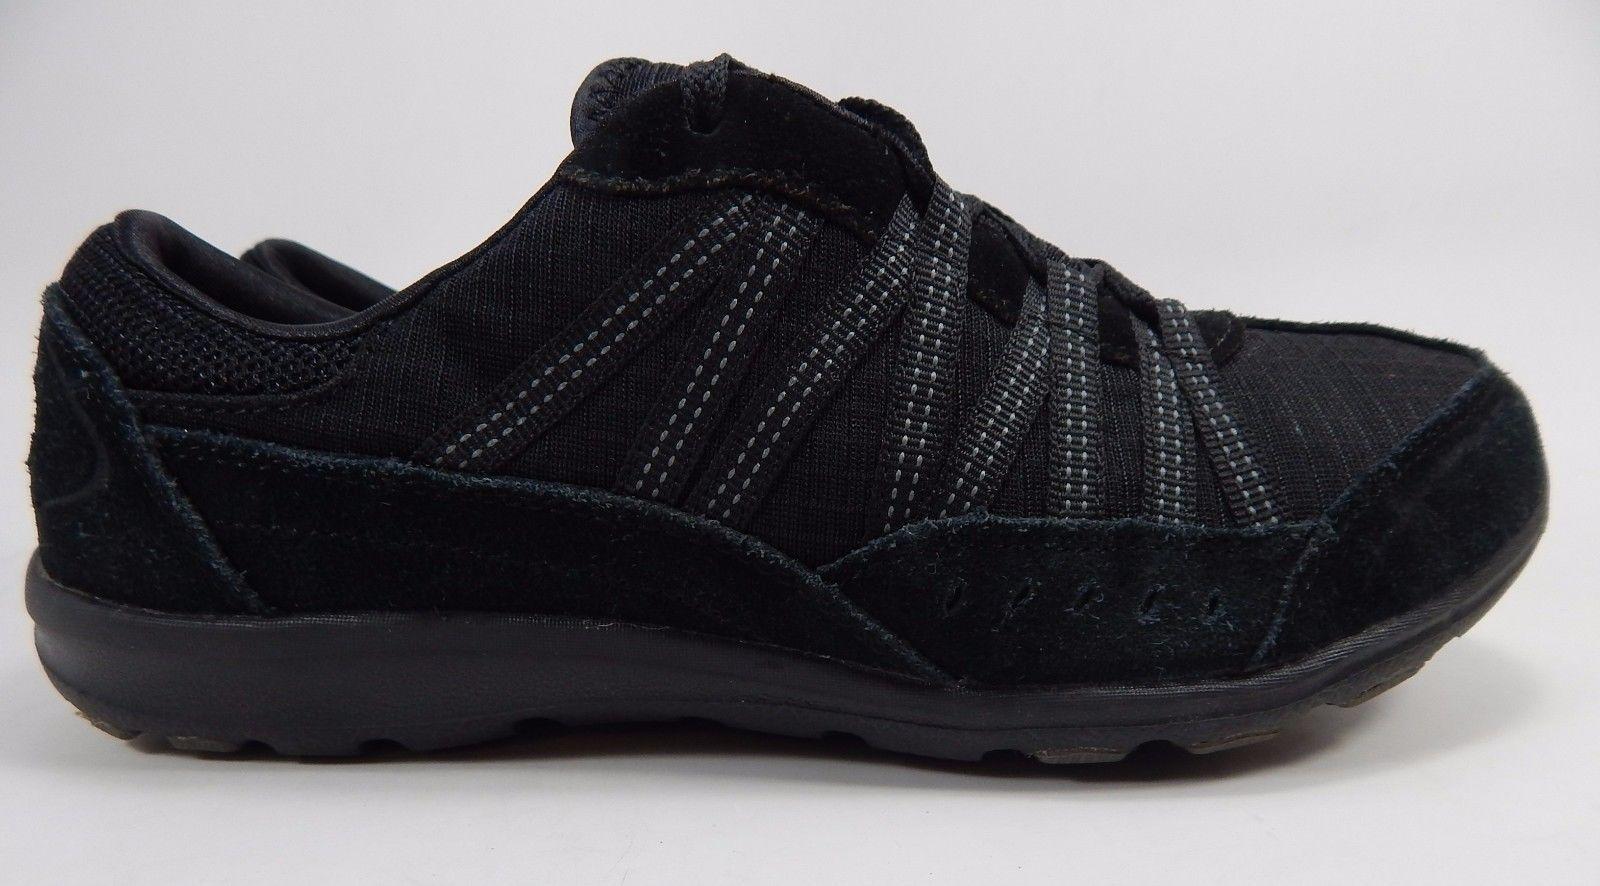 Skechers Relaxed Fit Dreamchaser Skylark Women's Shoes Size US 6.5 M (B) EU 36.5